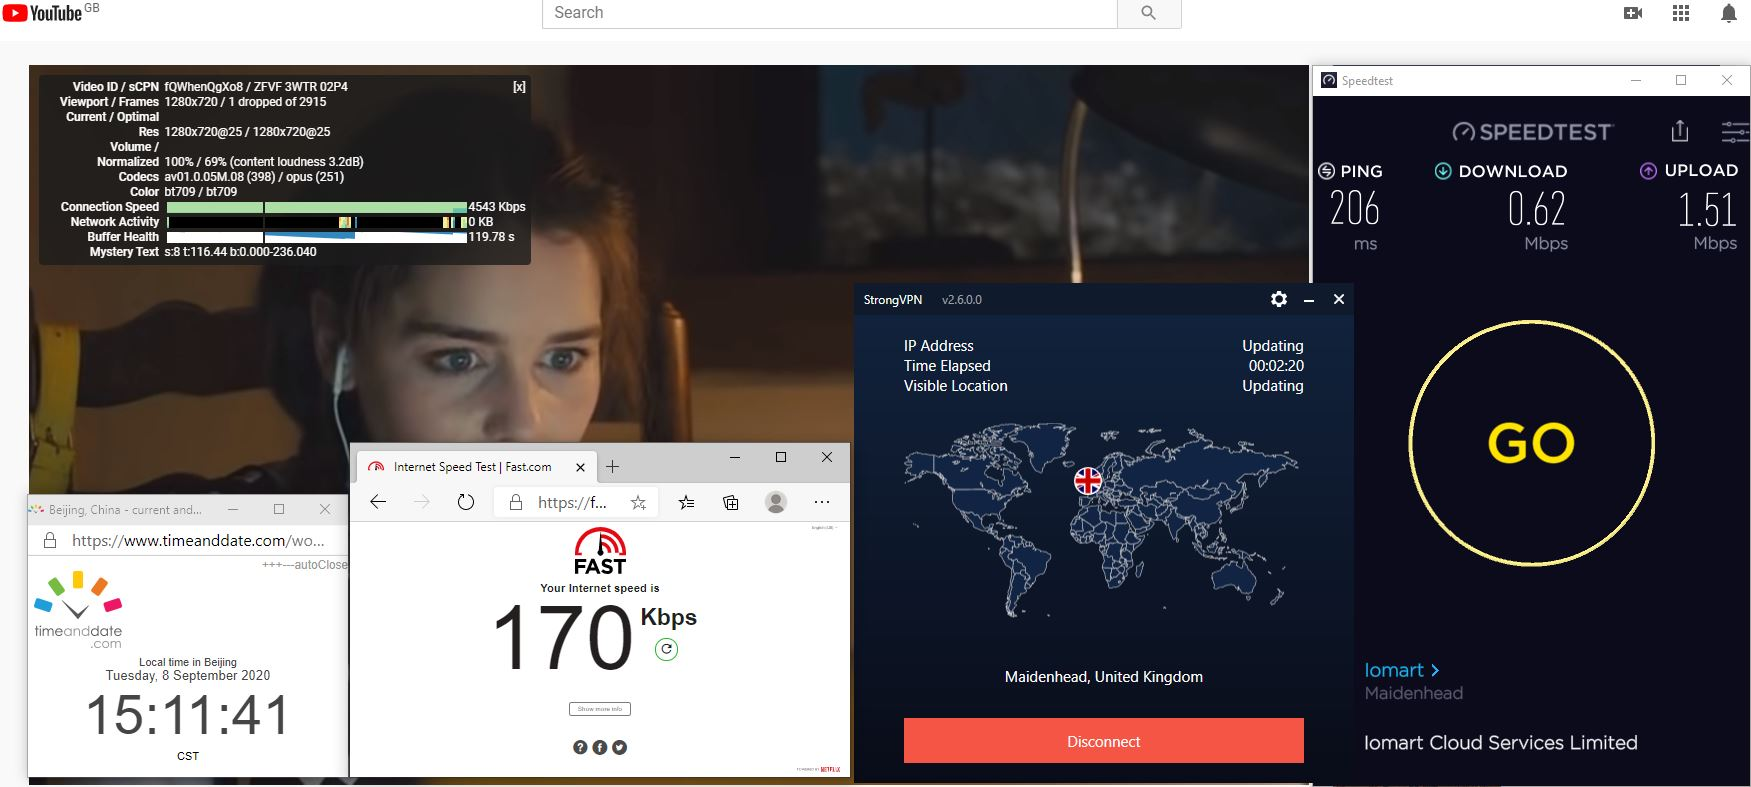 Windows10 StrongVPN UK - Maidenhead 中国VPN 翻墙 科学上网 翻墙速度测试 - 20200908